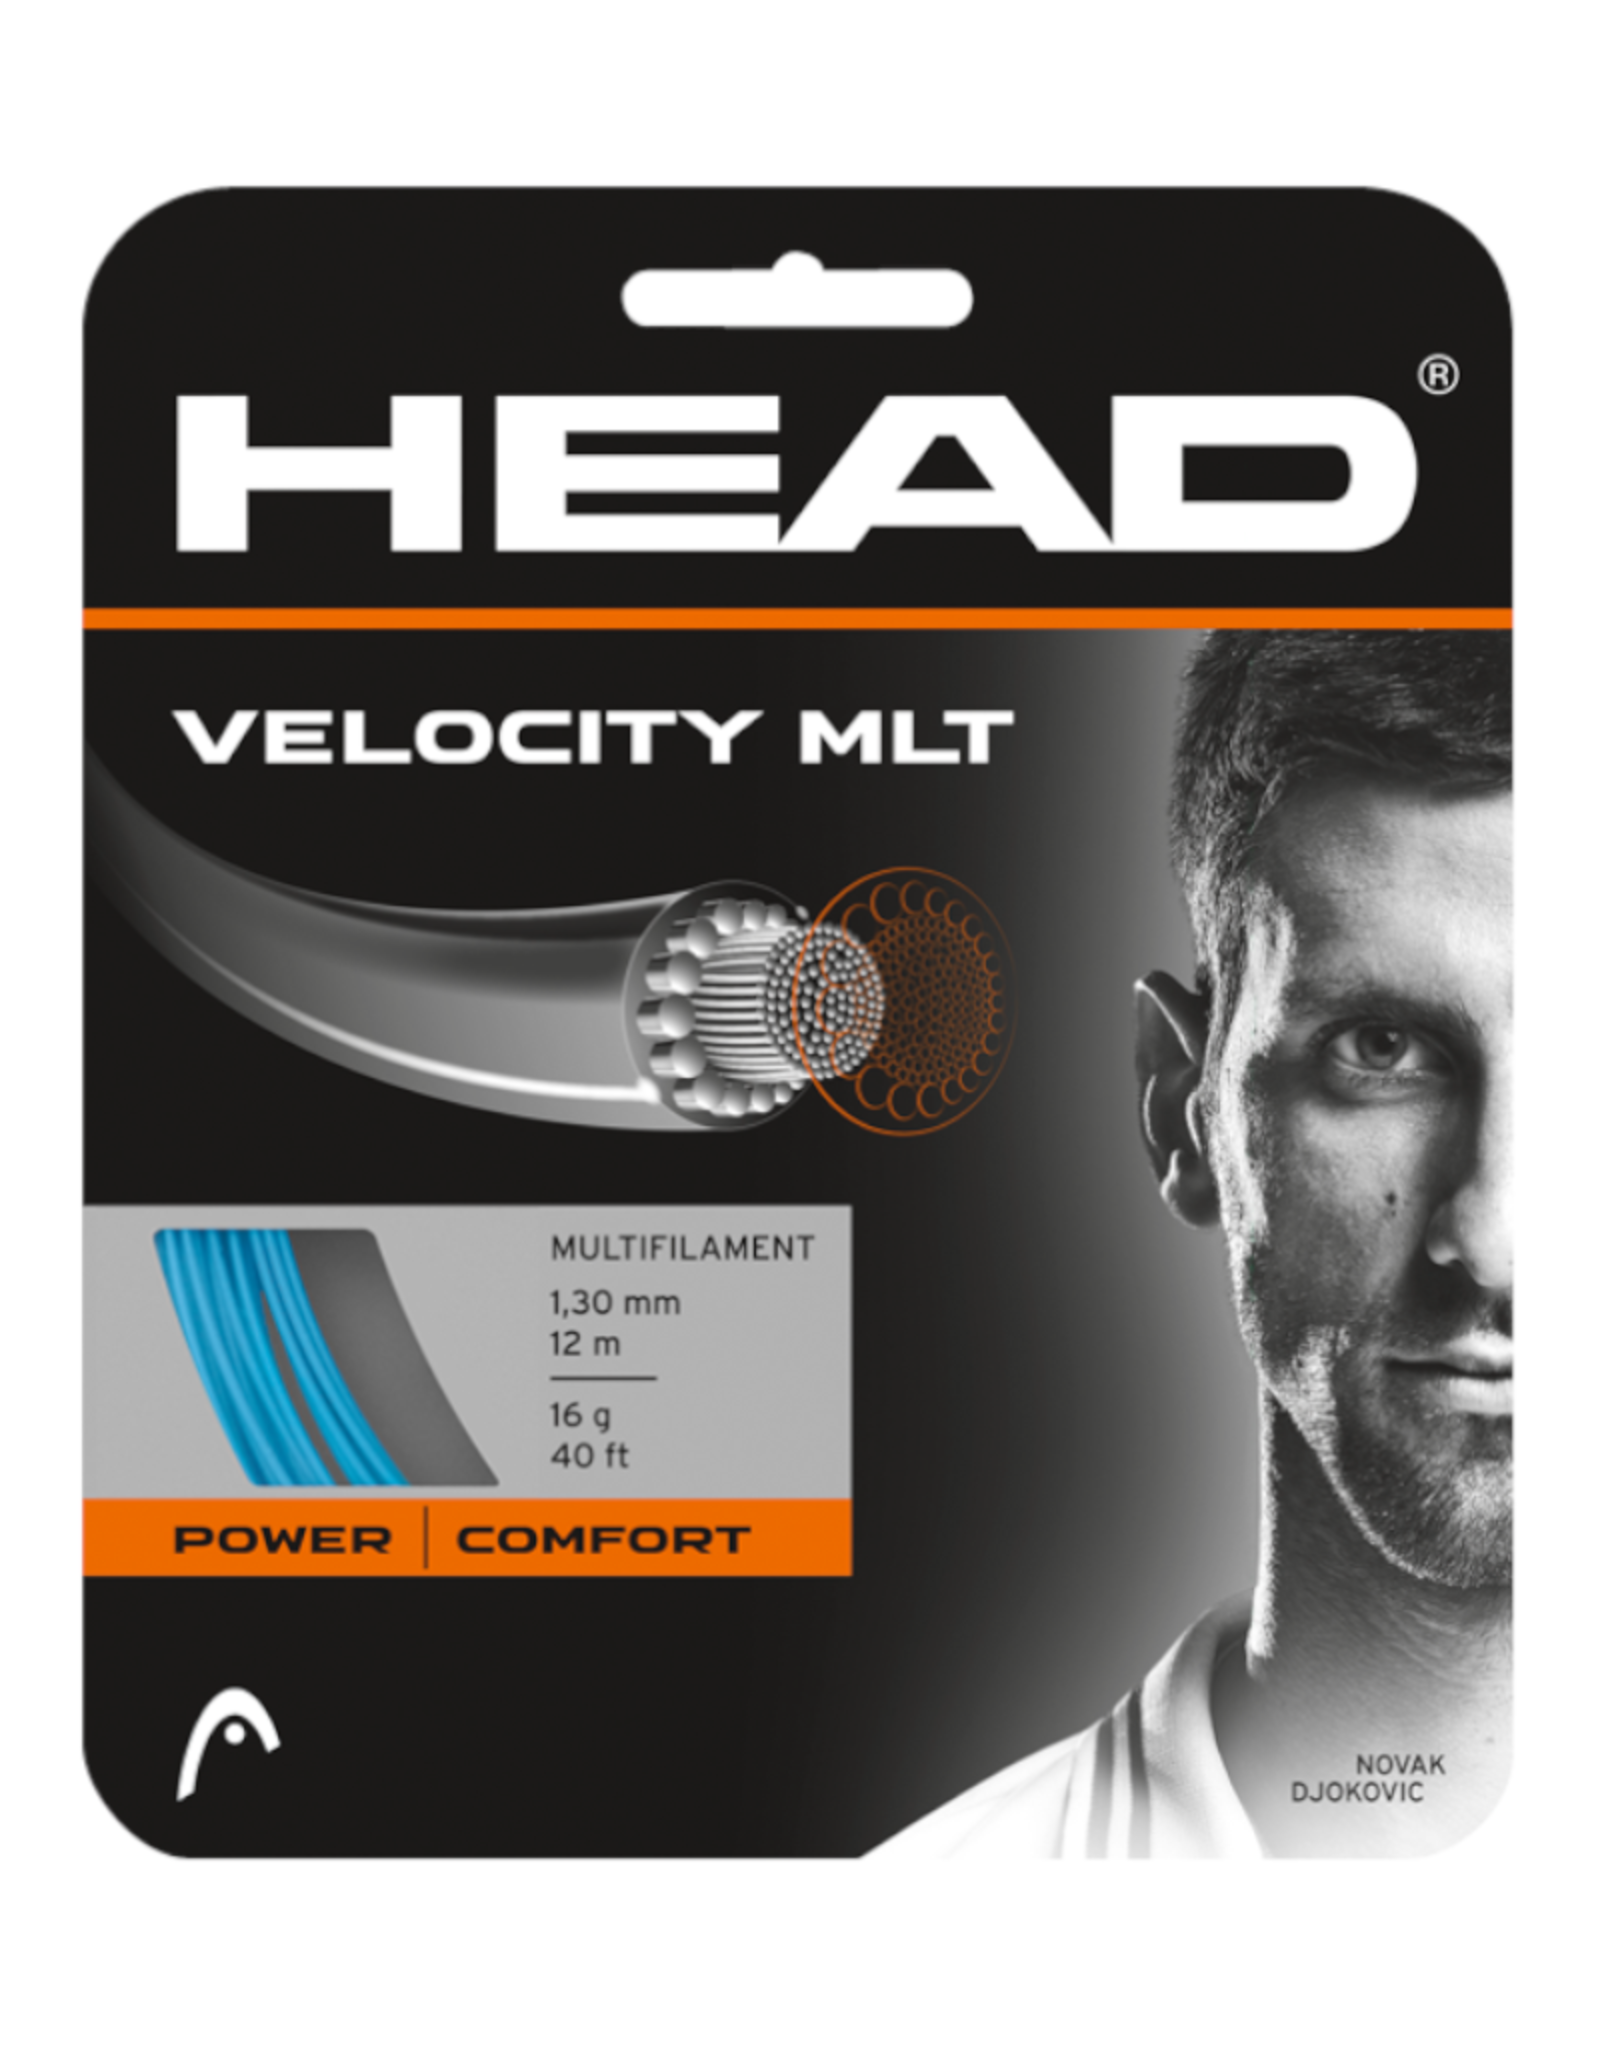 HEAD VELOCITY 16 FULL SET